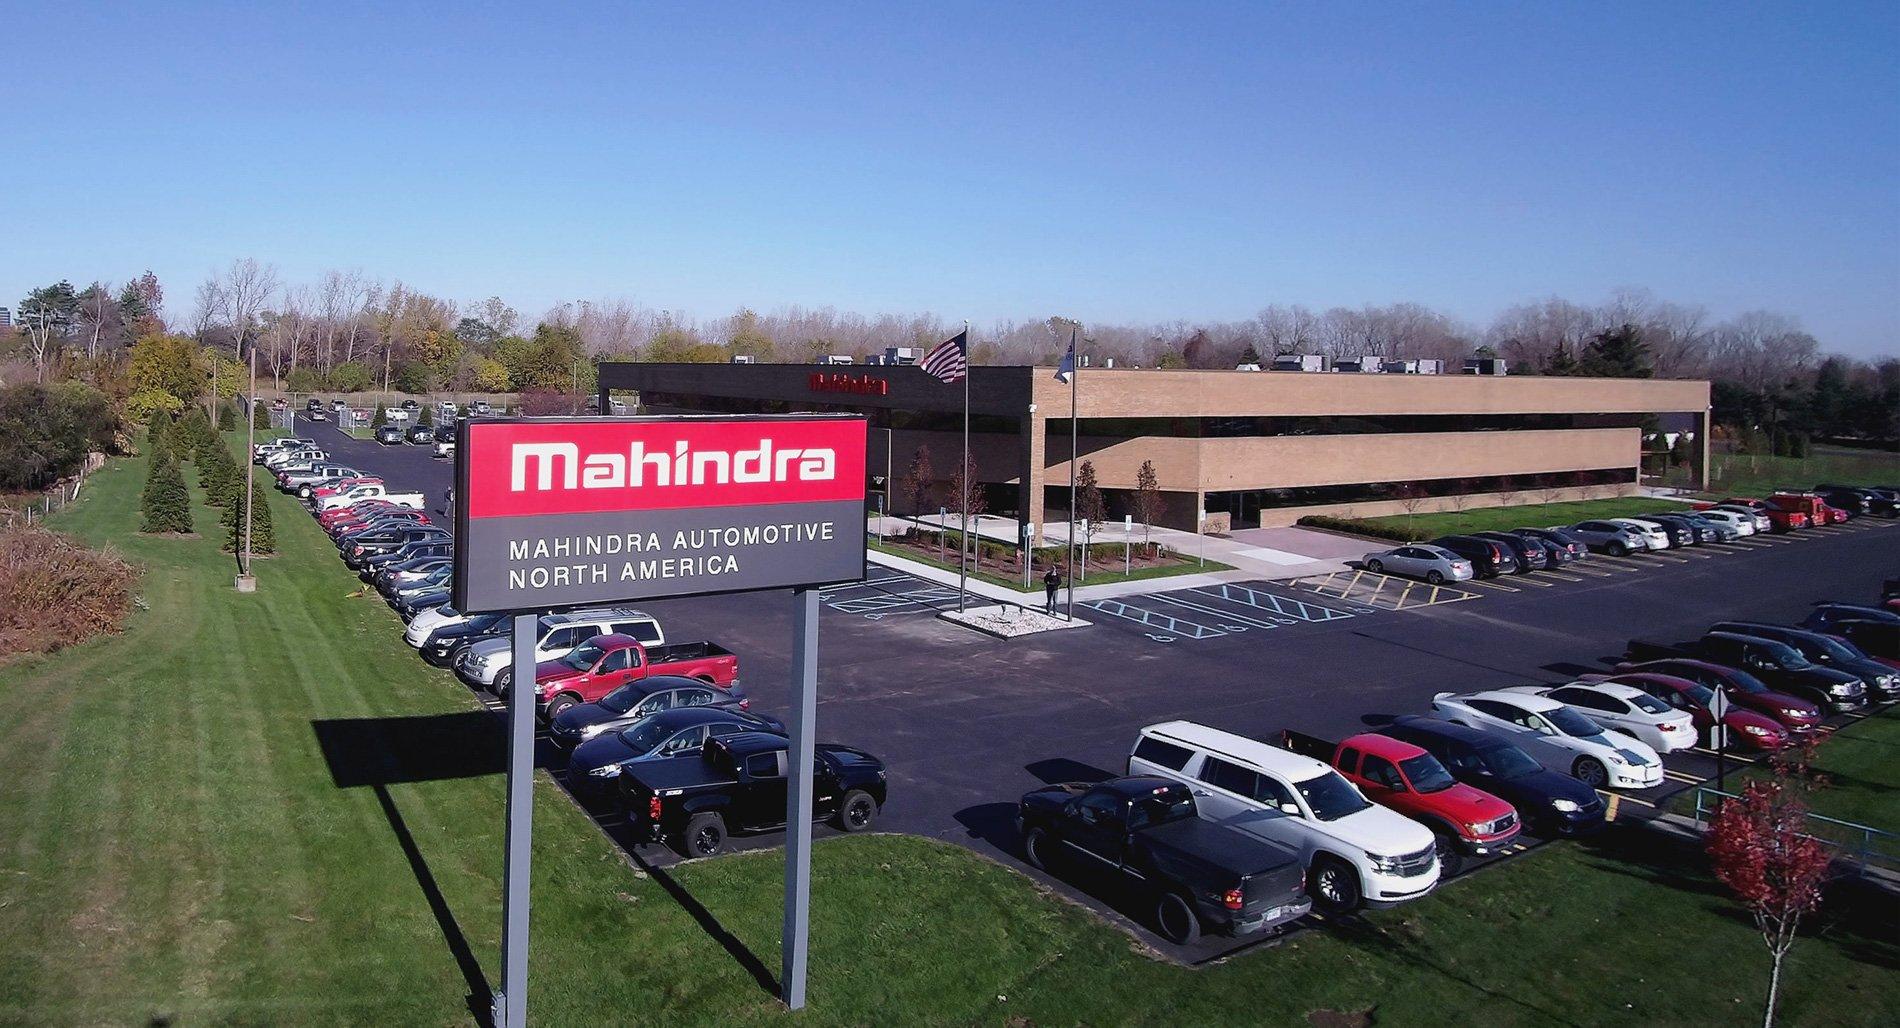 Mahindra Automotive North America